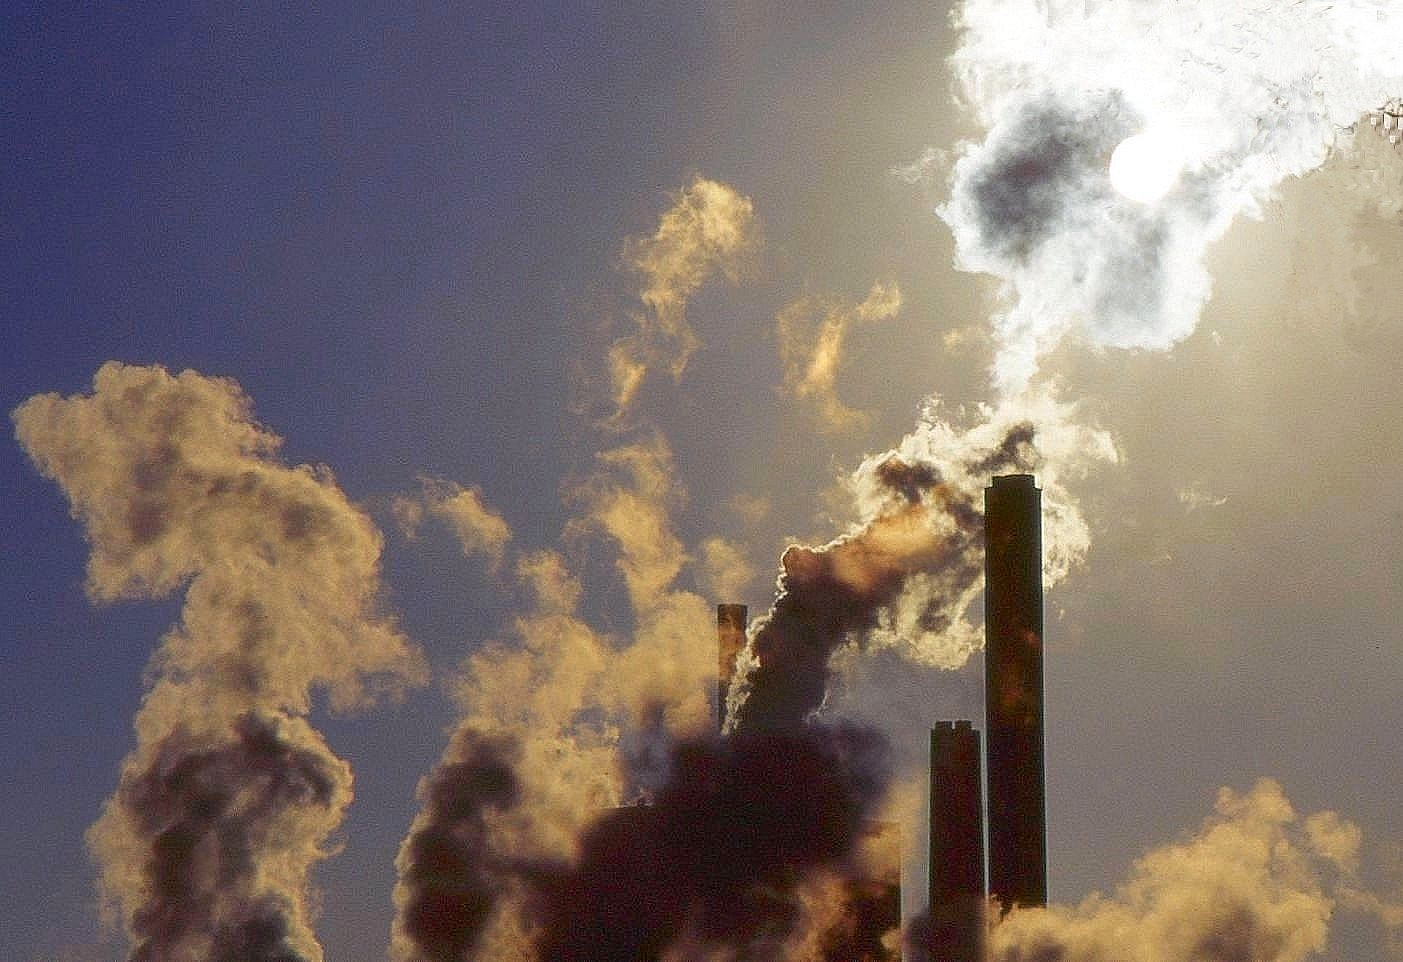 Fumées, pollution, émanations, rejets...